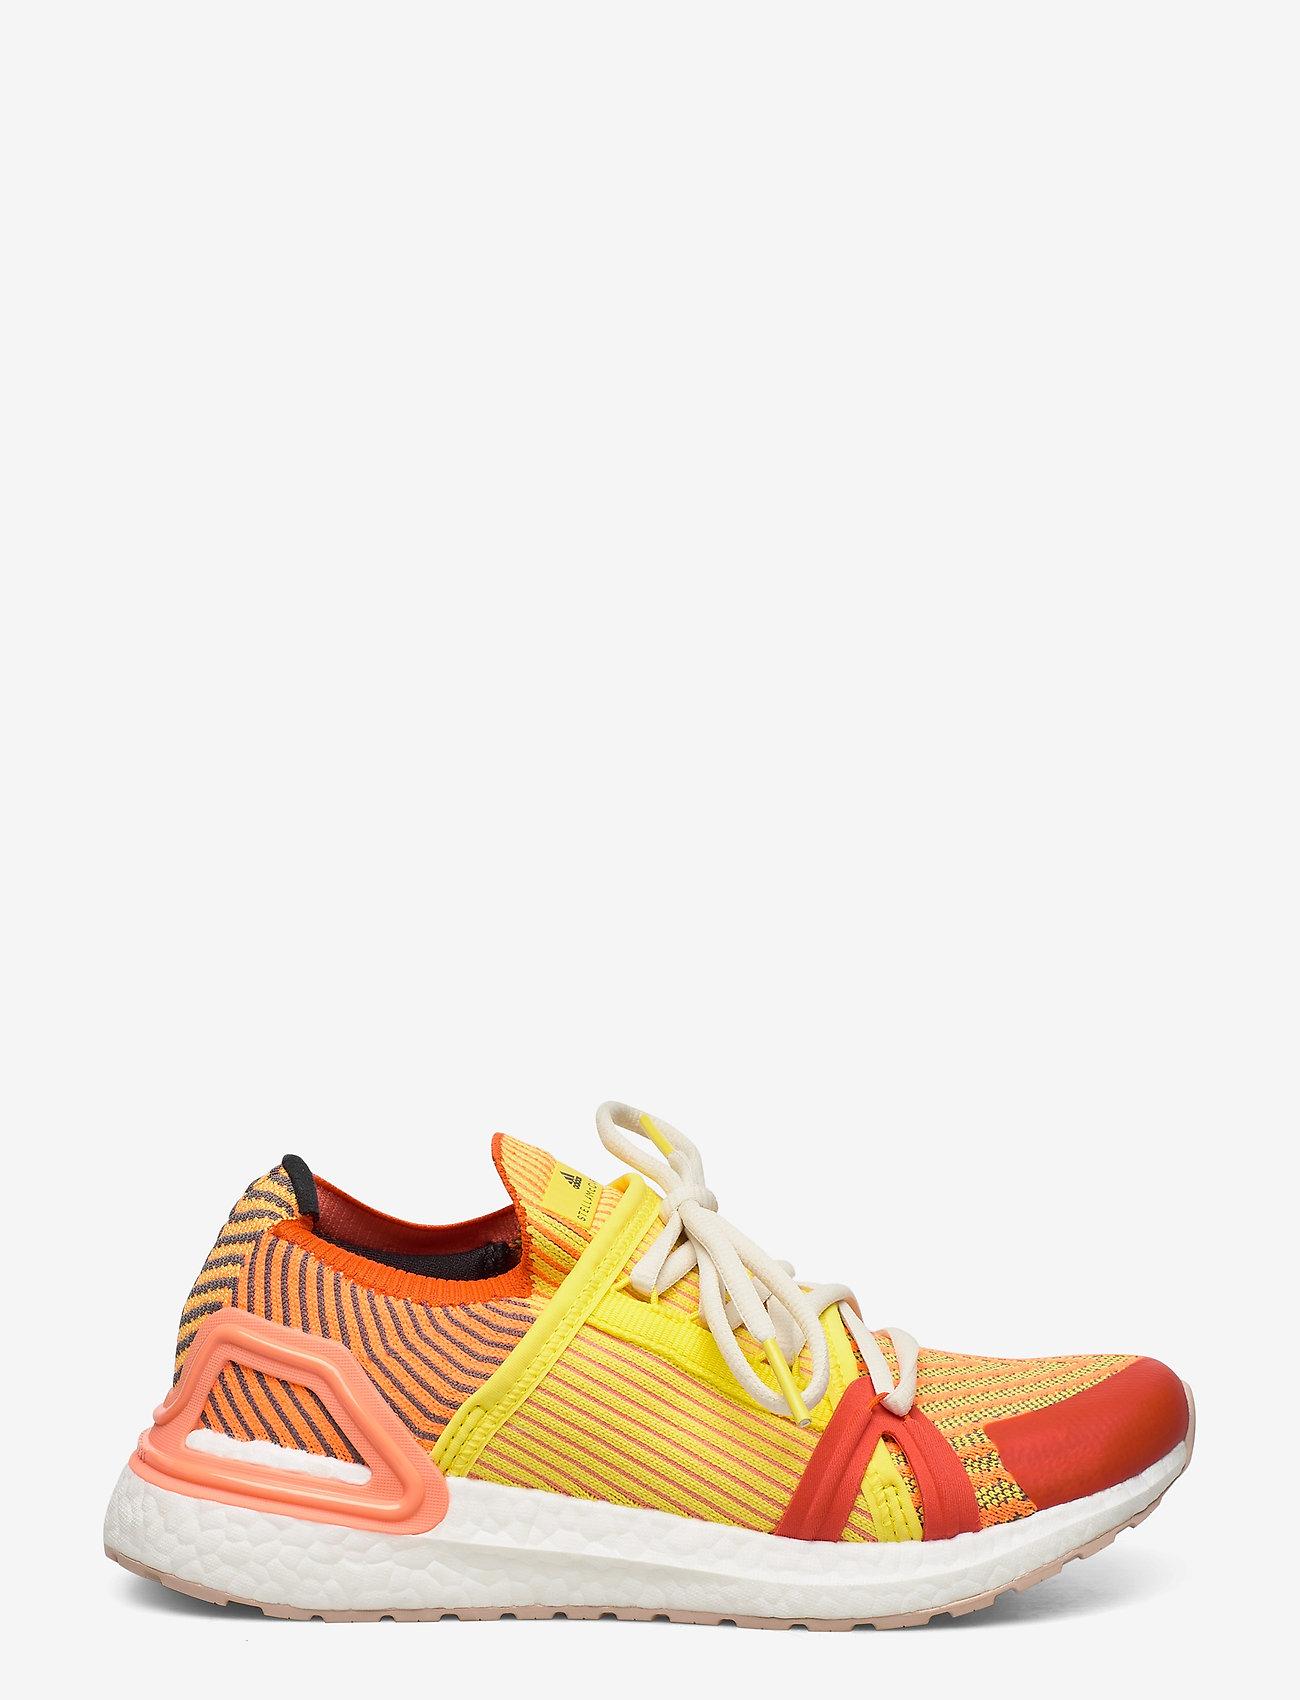 Adidas By Stella Mccartney Ultraboost 20 S. - Sport Shoes